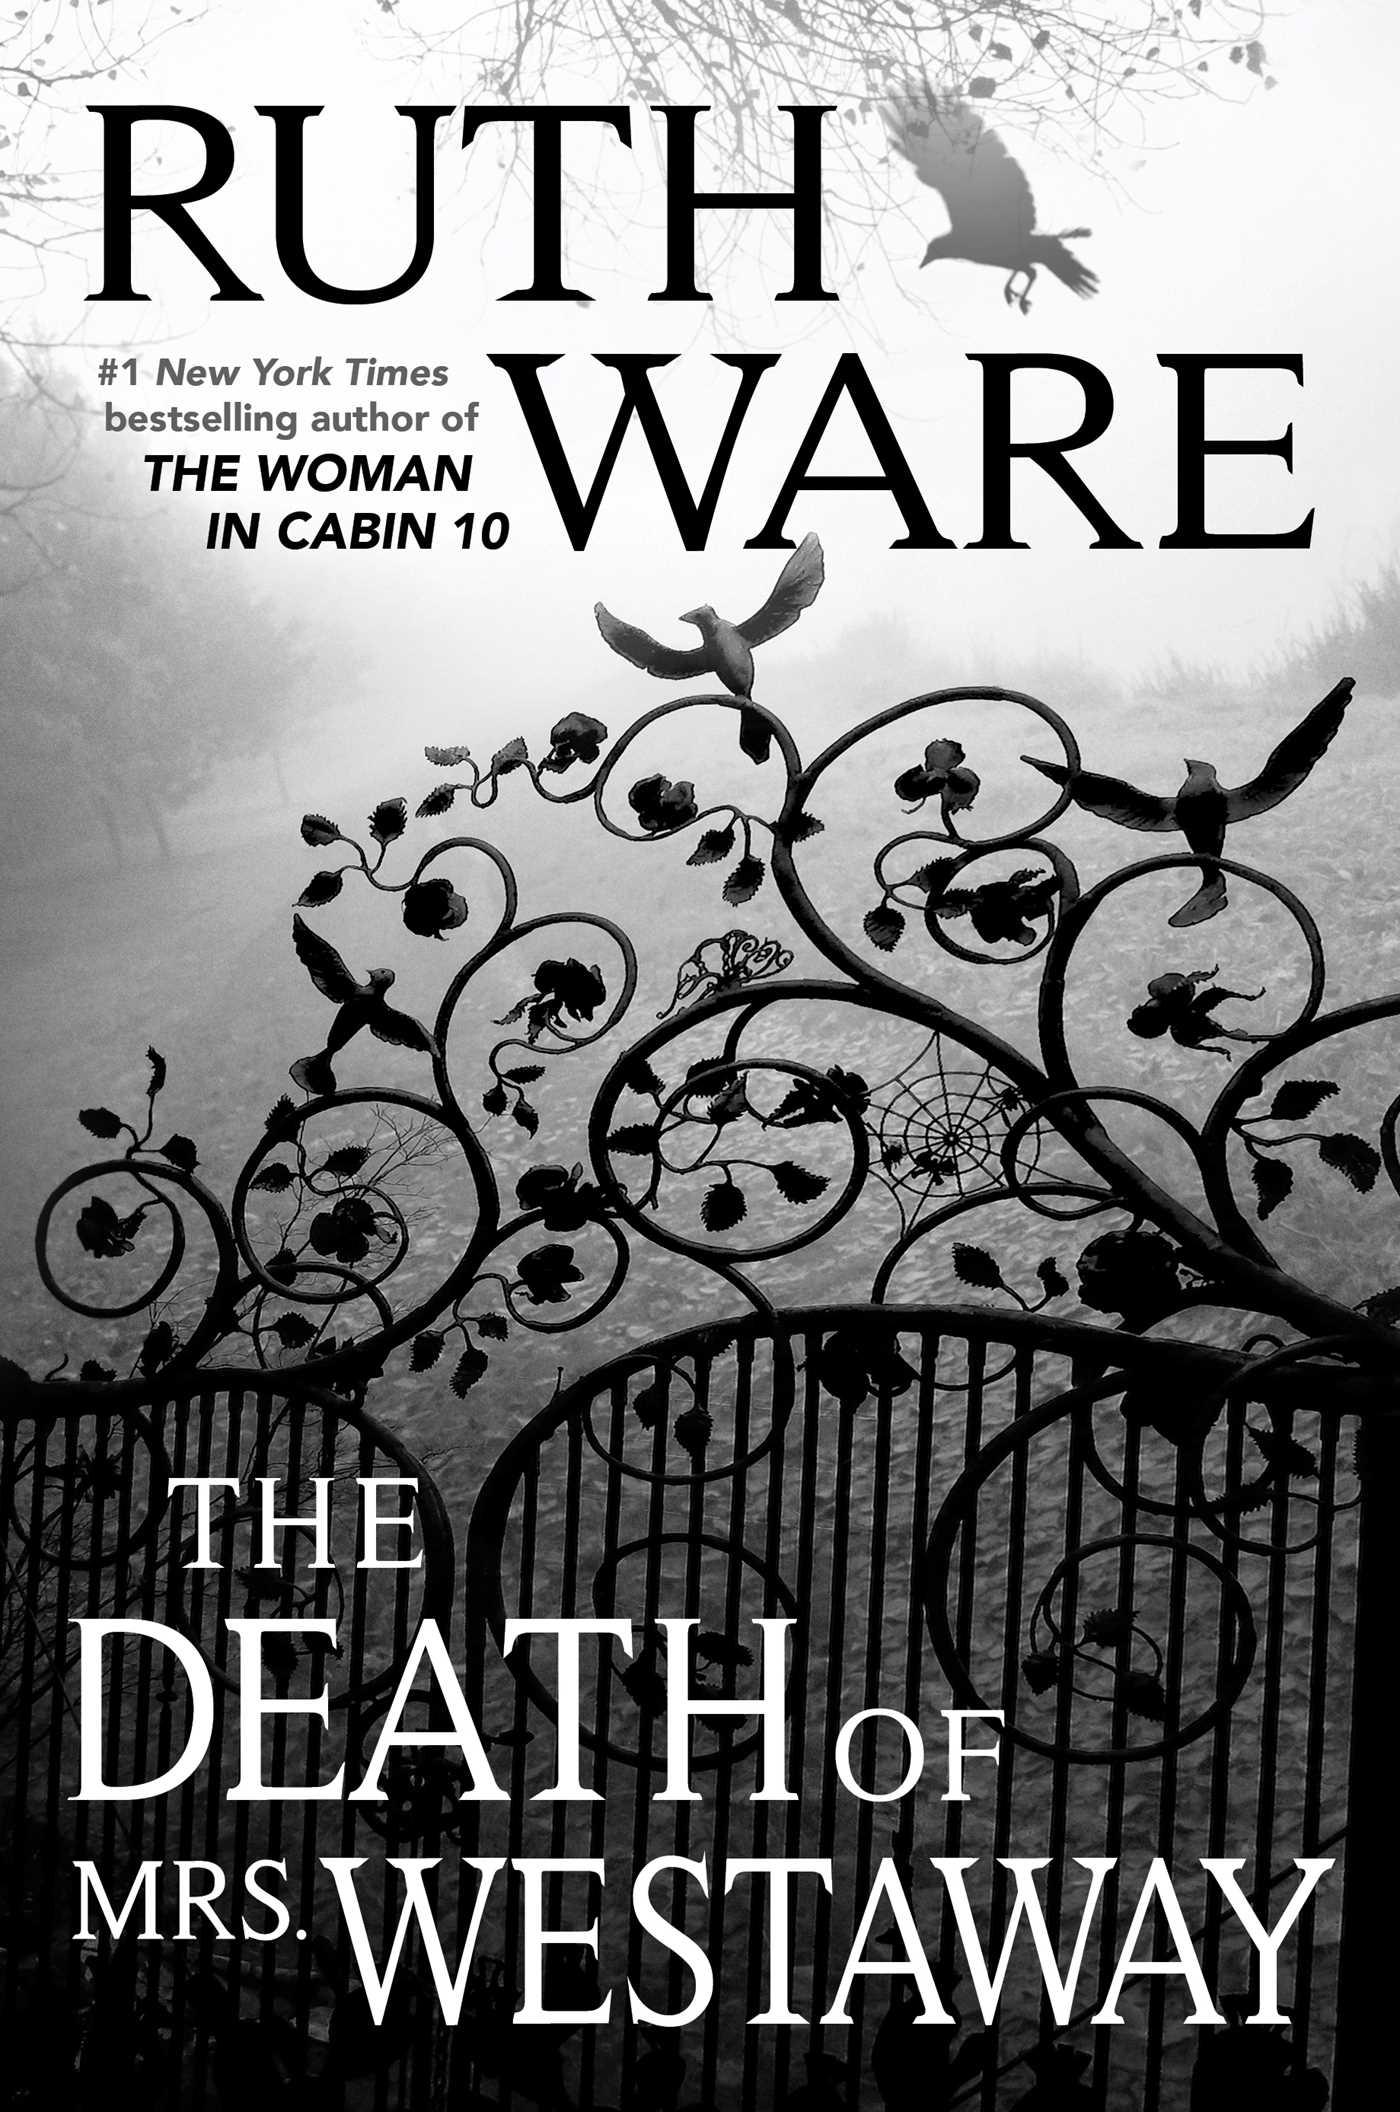 The death of mrs westaway 9781501151842 hr